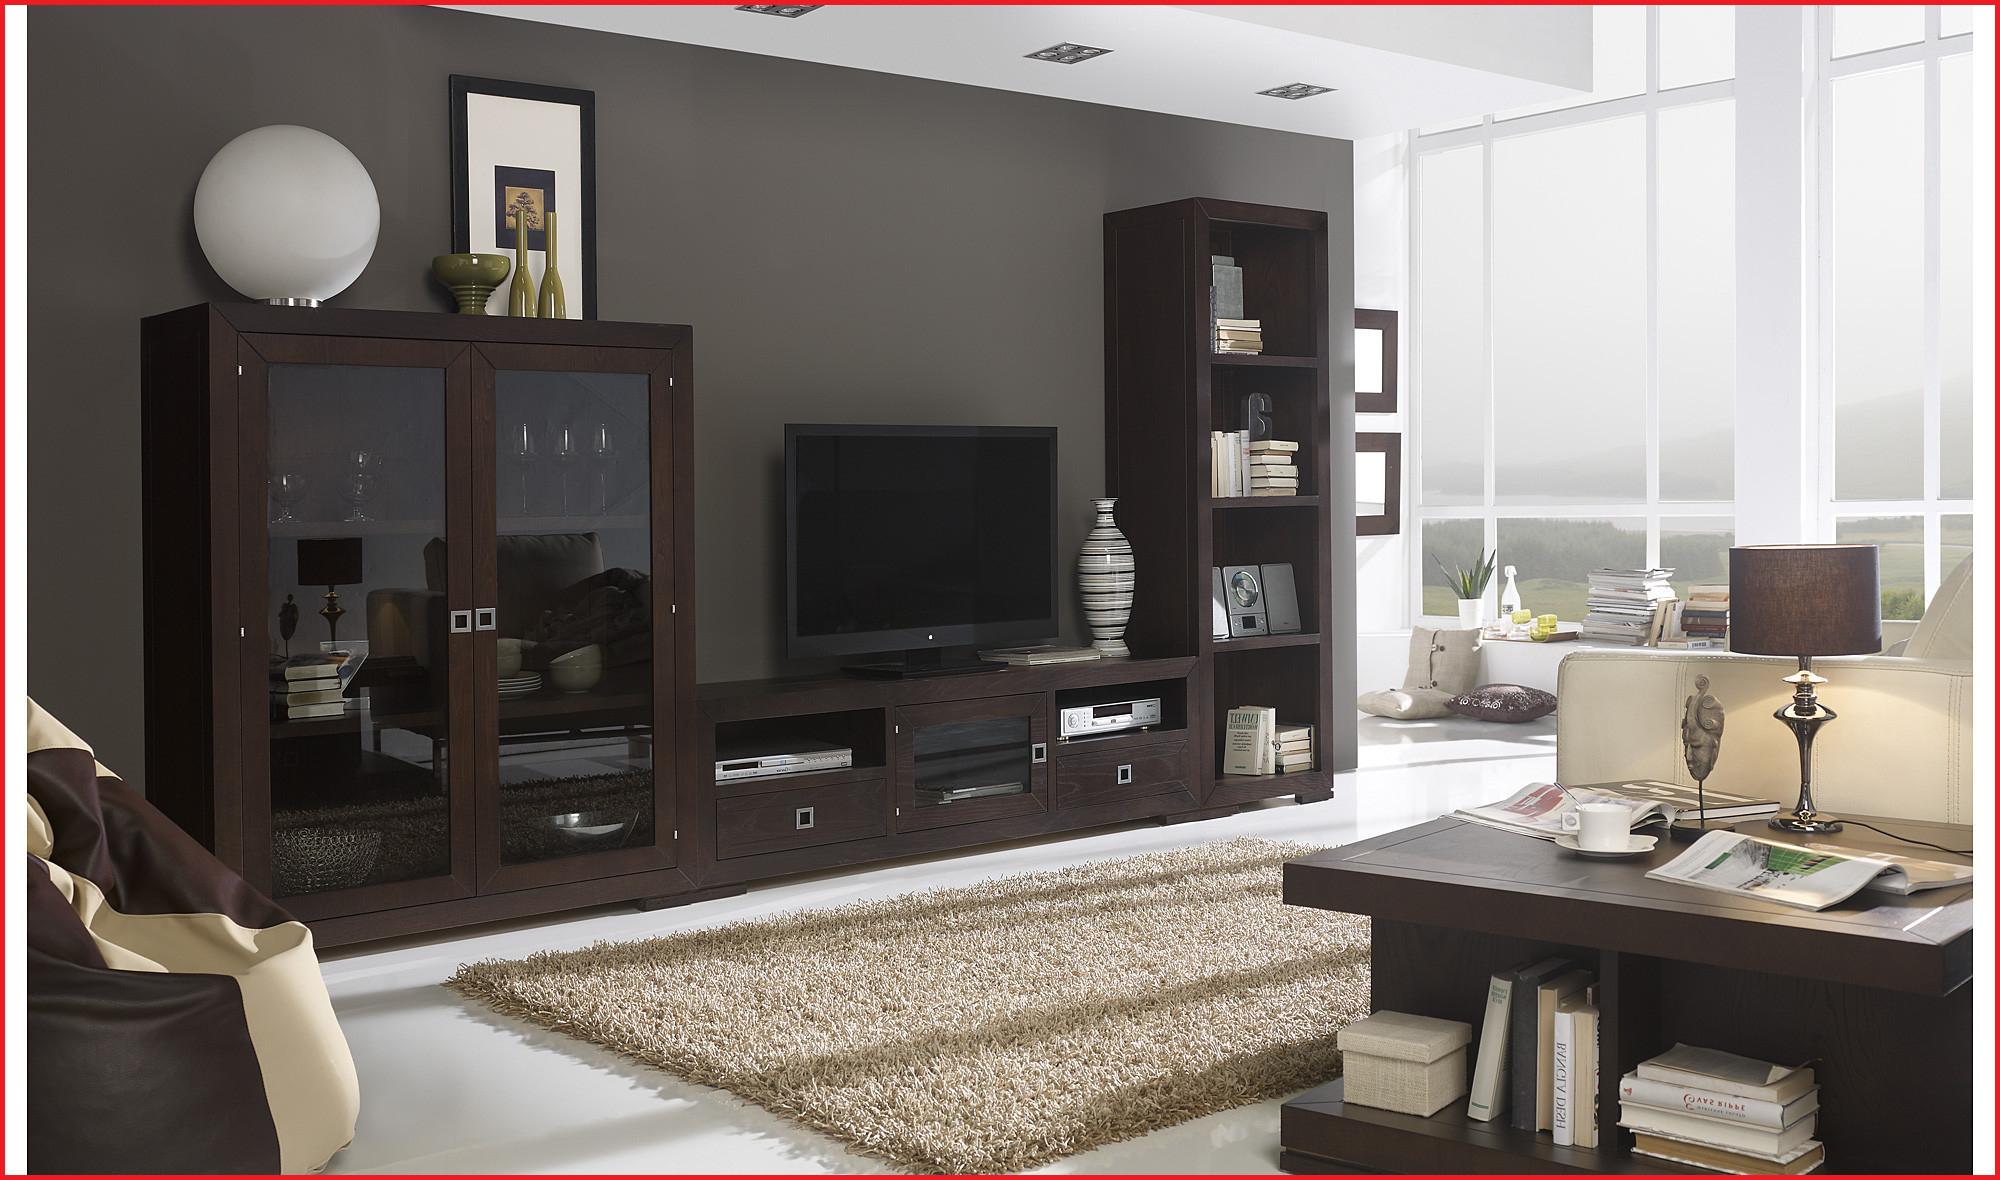 Diseño De Armarios Qwdq Muebles De Salon De Diseà O Moderno software DiseO Armarios